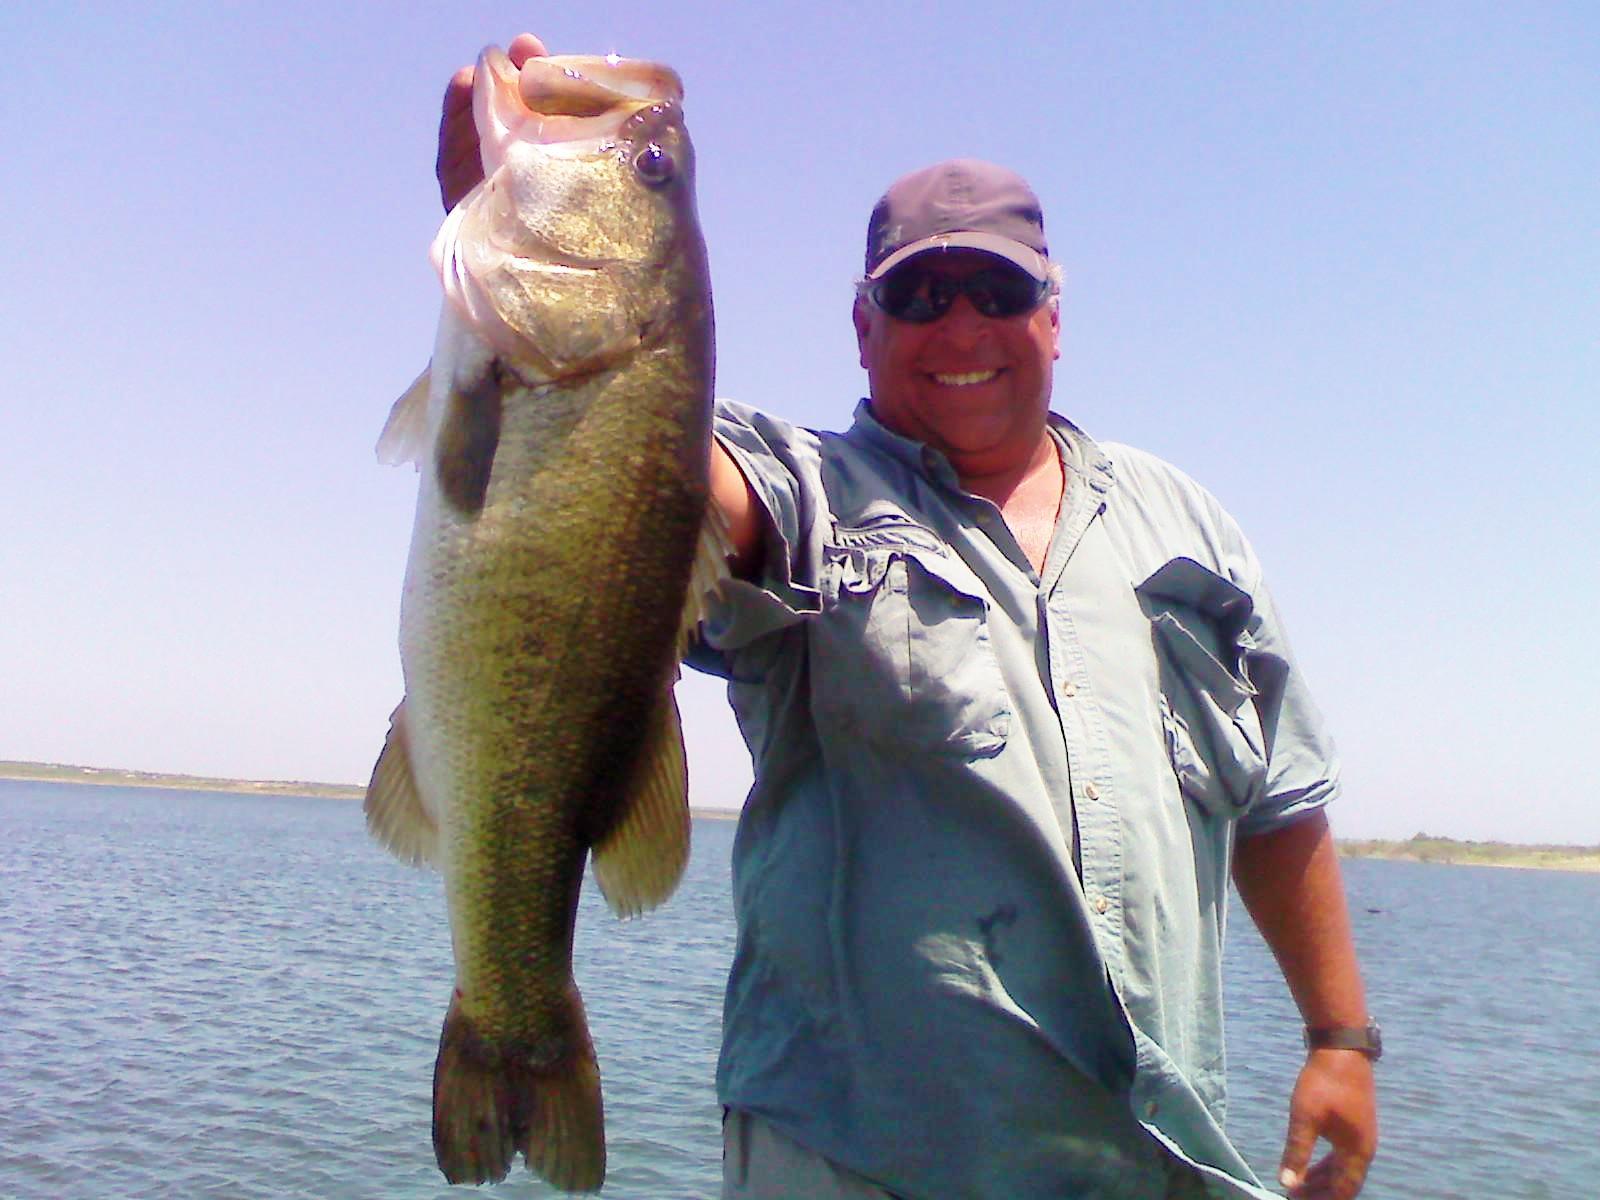 Mike folkestad bass fishing blog bass fishing for Bass fishing times